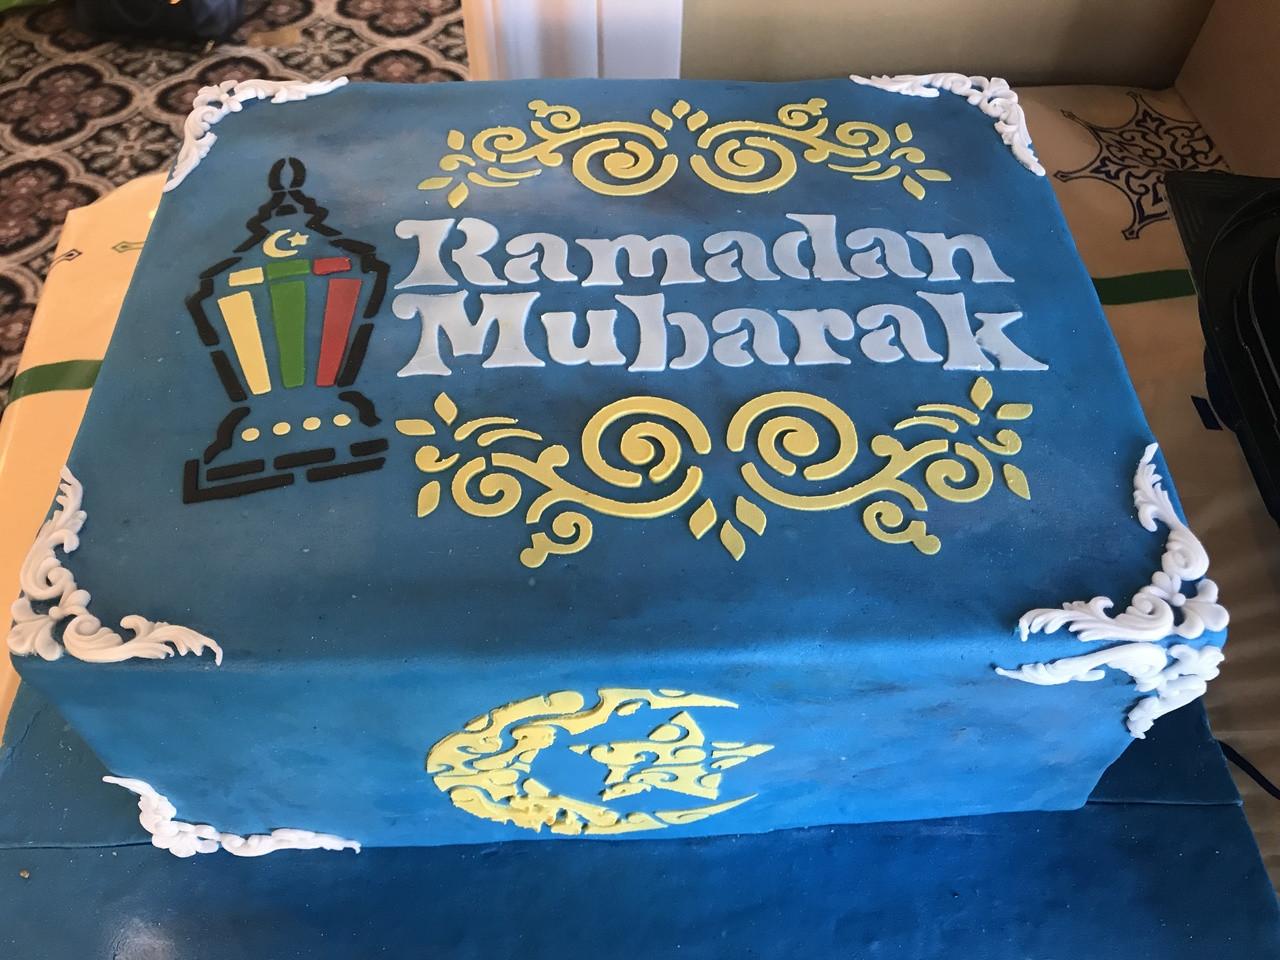 Ramadan Stencil Set of 2 (1 Arabic & 1 English)